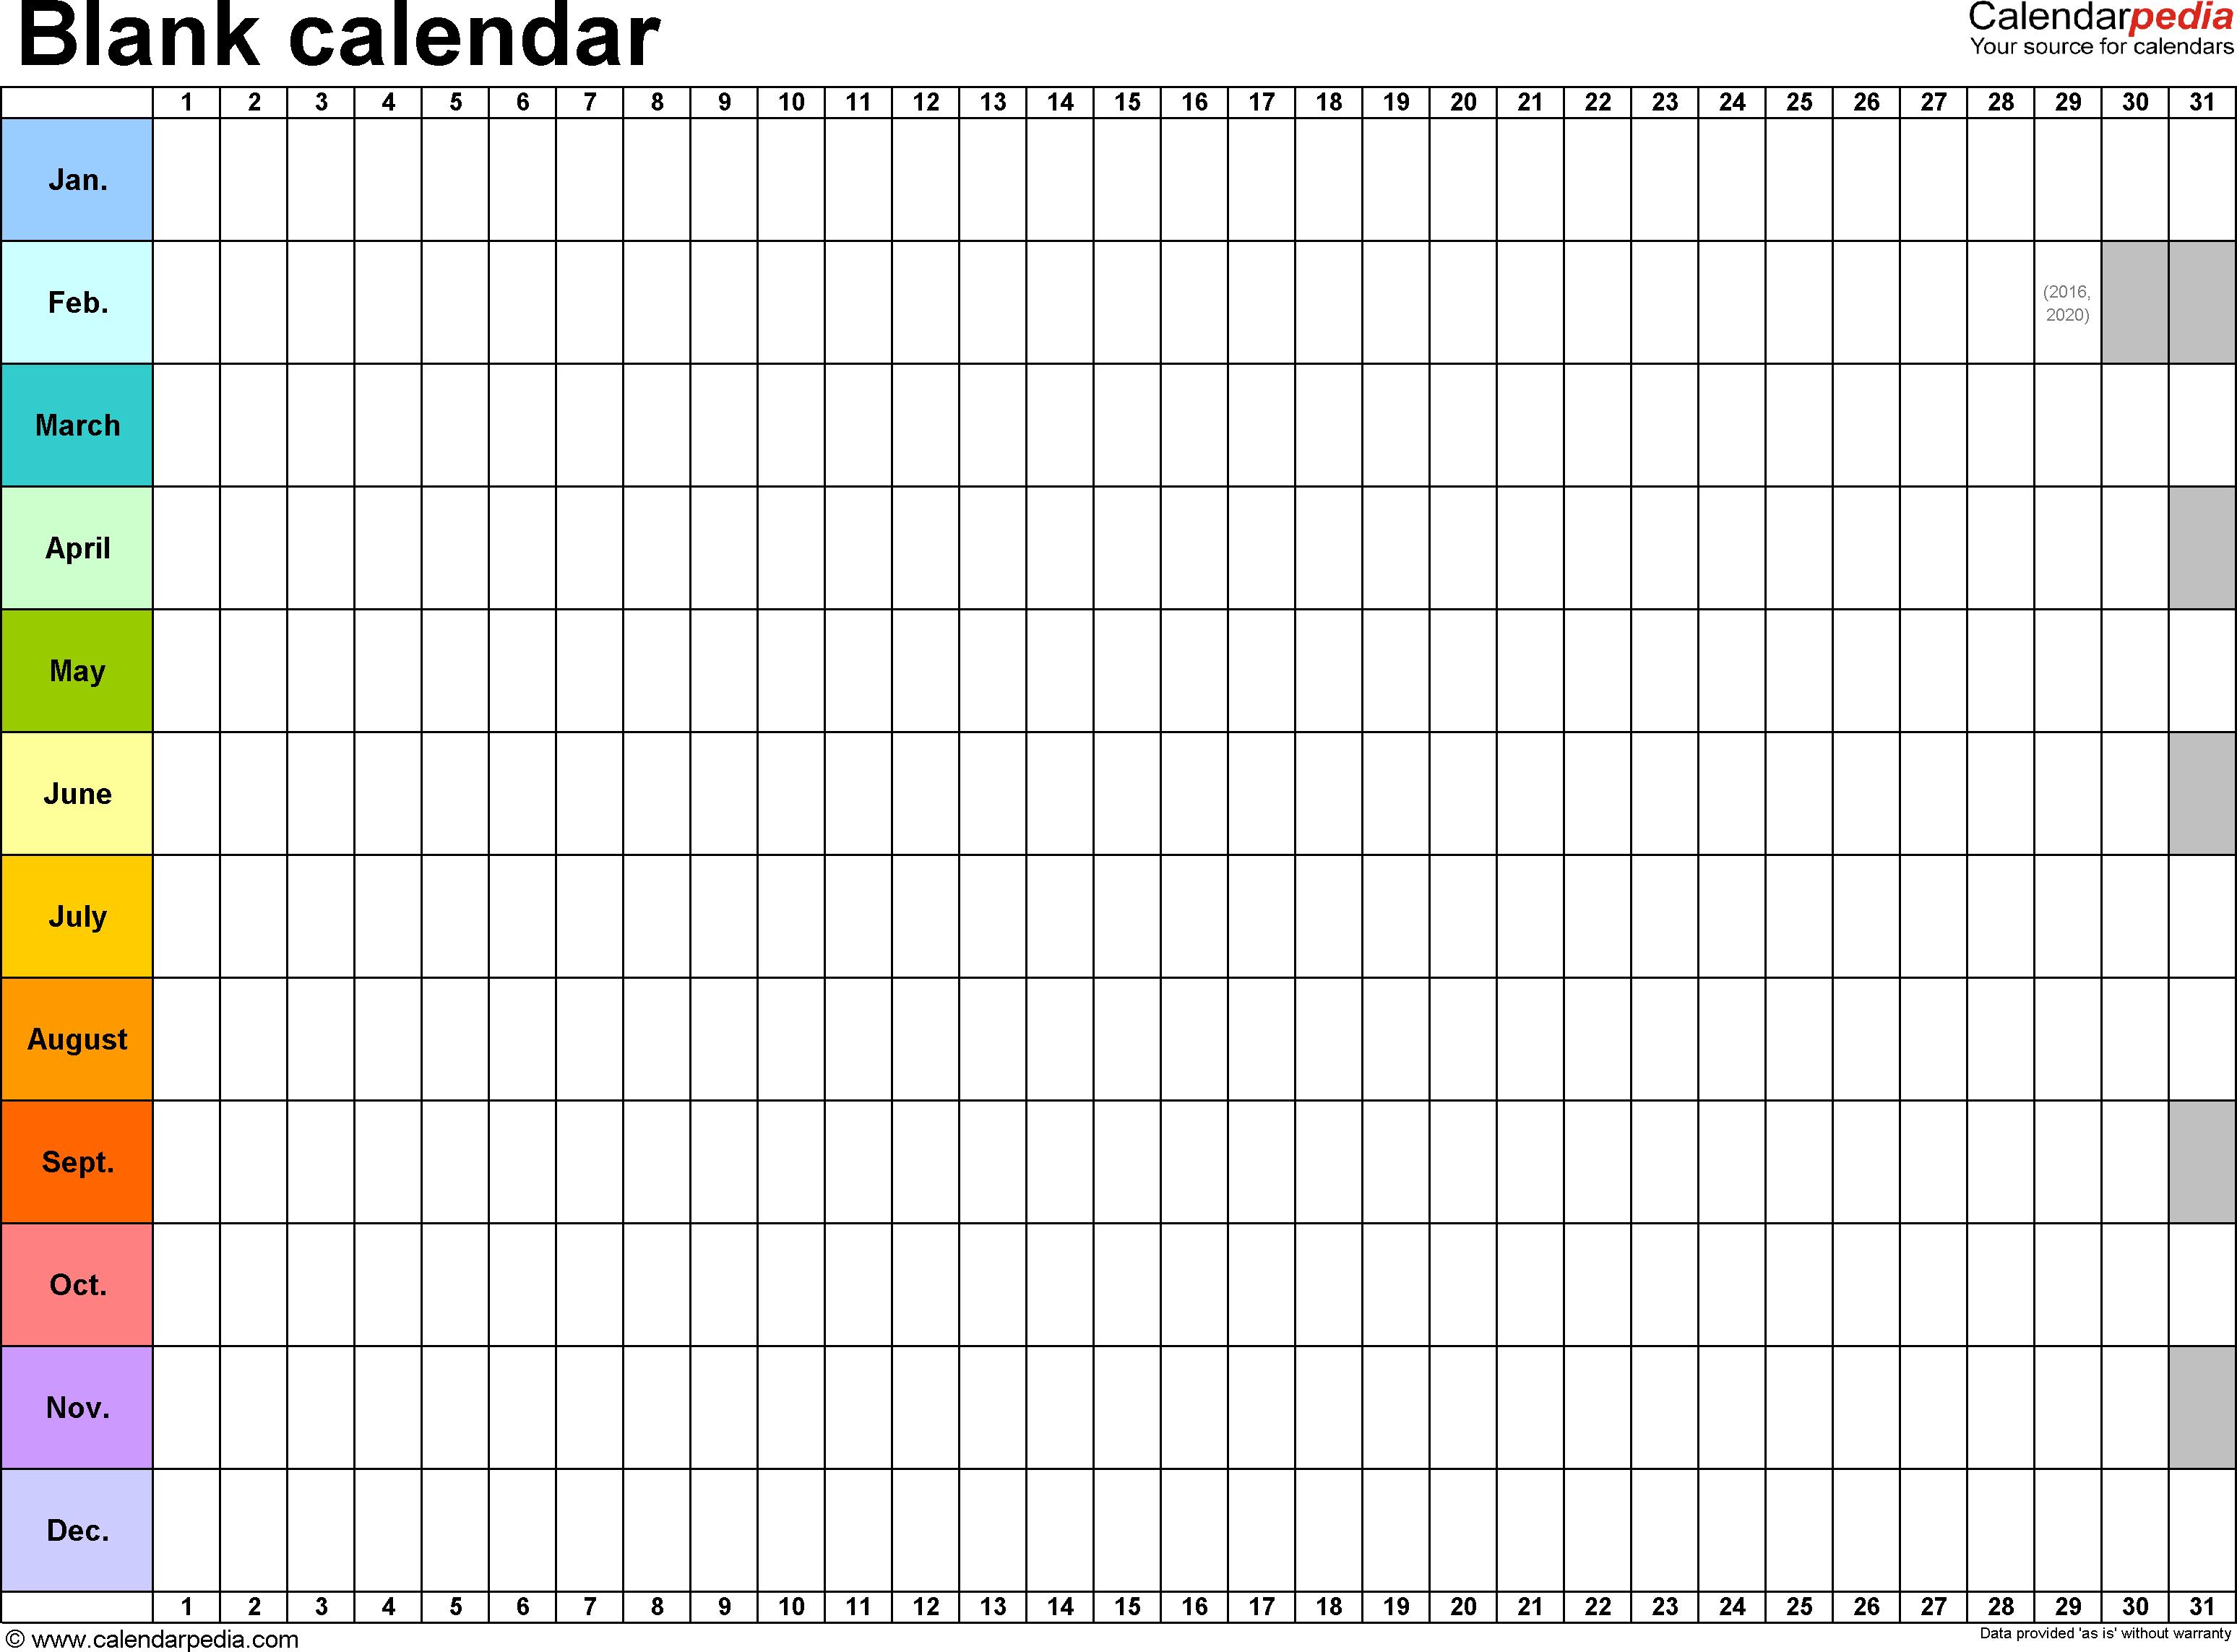 Blank Calendar - 9 Free Printable Microsoft Word Templates throughout Printable Blank 31 Day Calendar